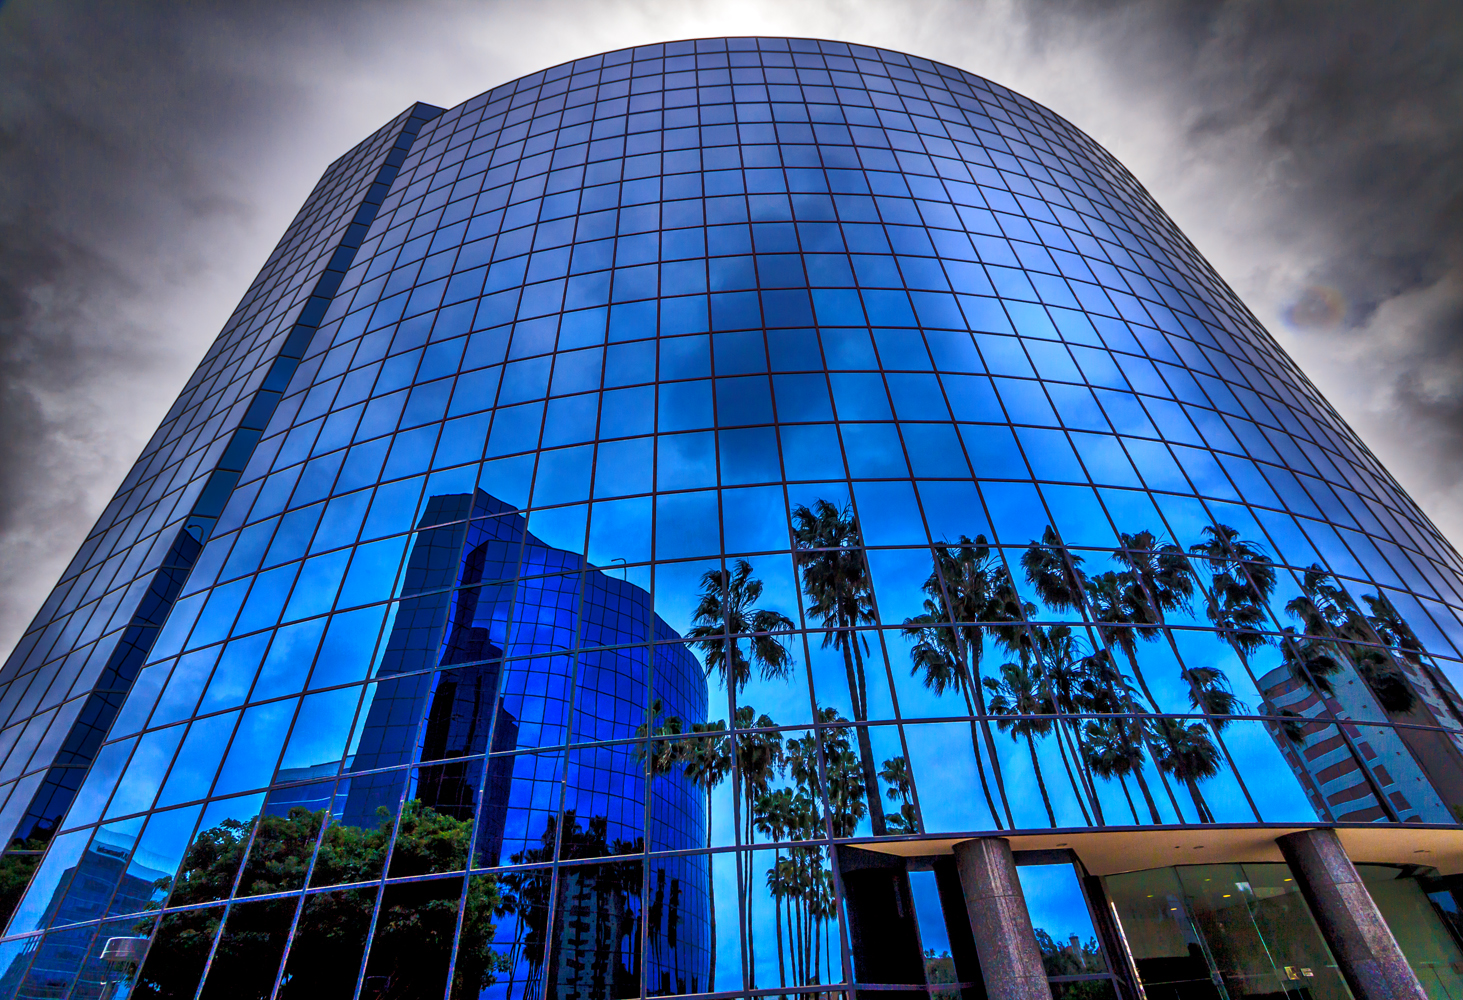 Architecture photo, San Diego